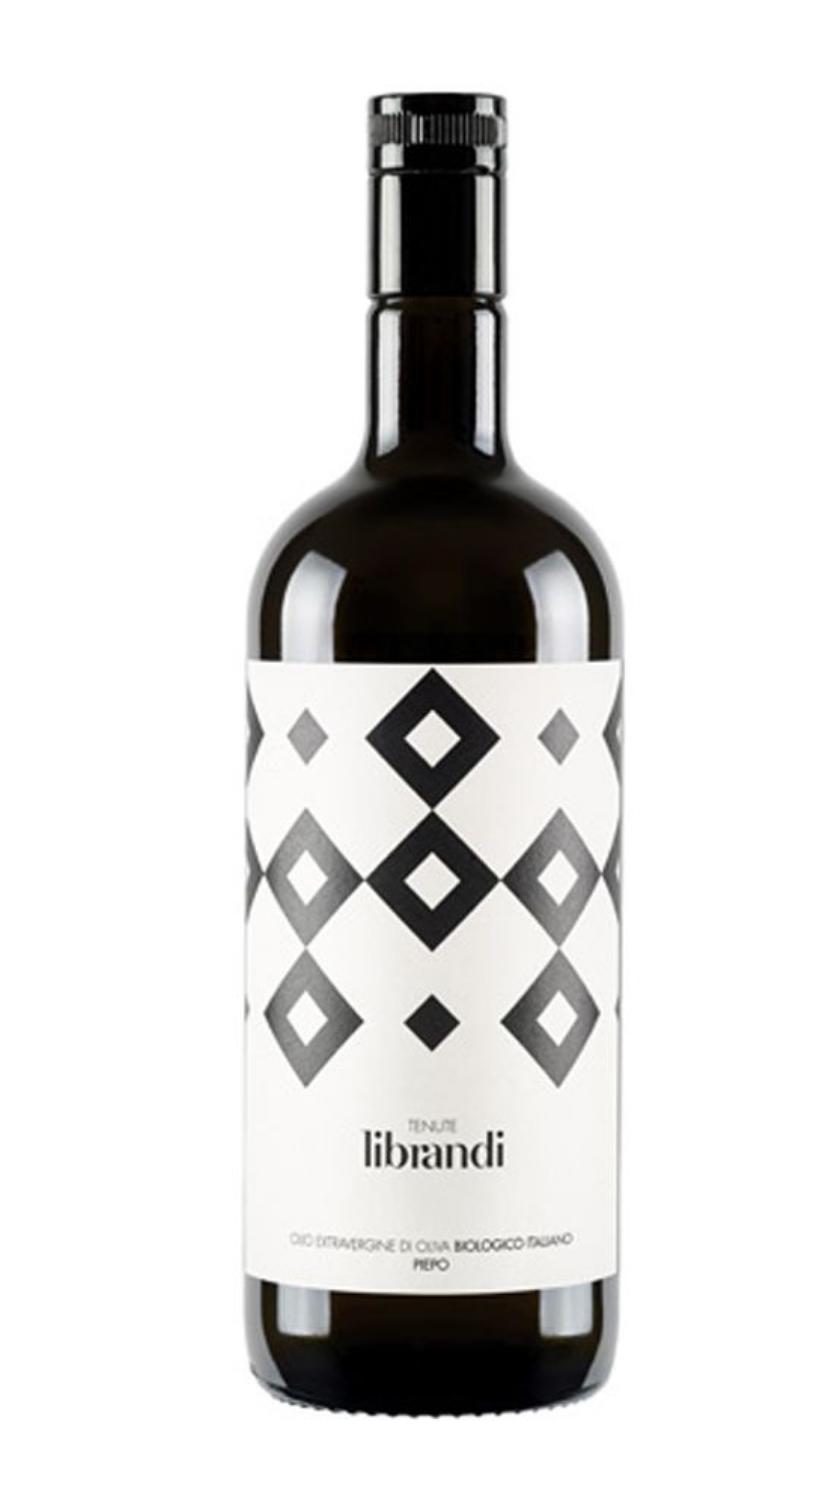 Tenute librandi - Luxus Bio Olivenöl Kalabrien - extra vergine - biologico italiano